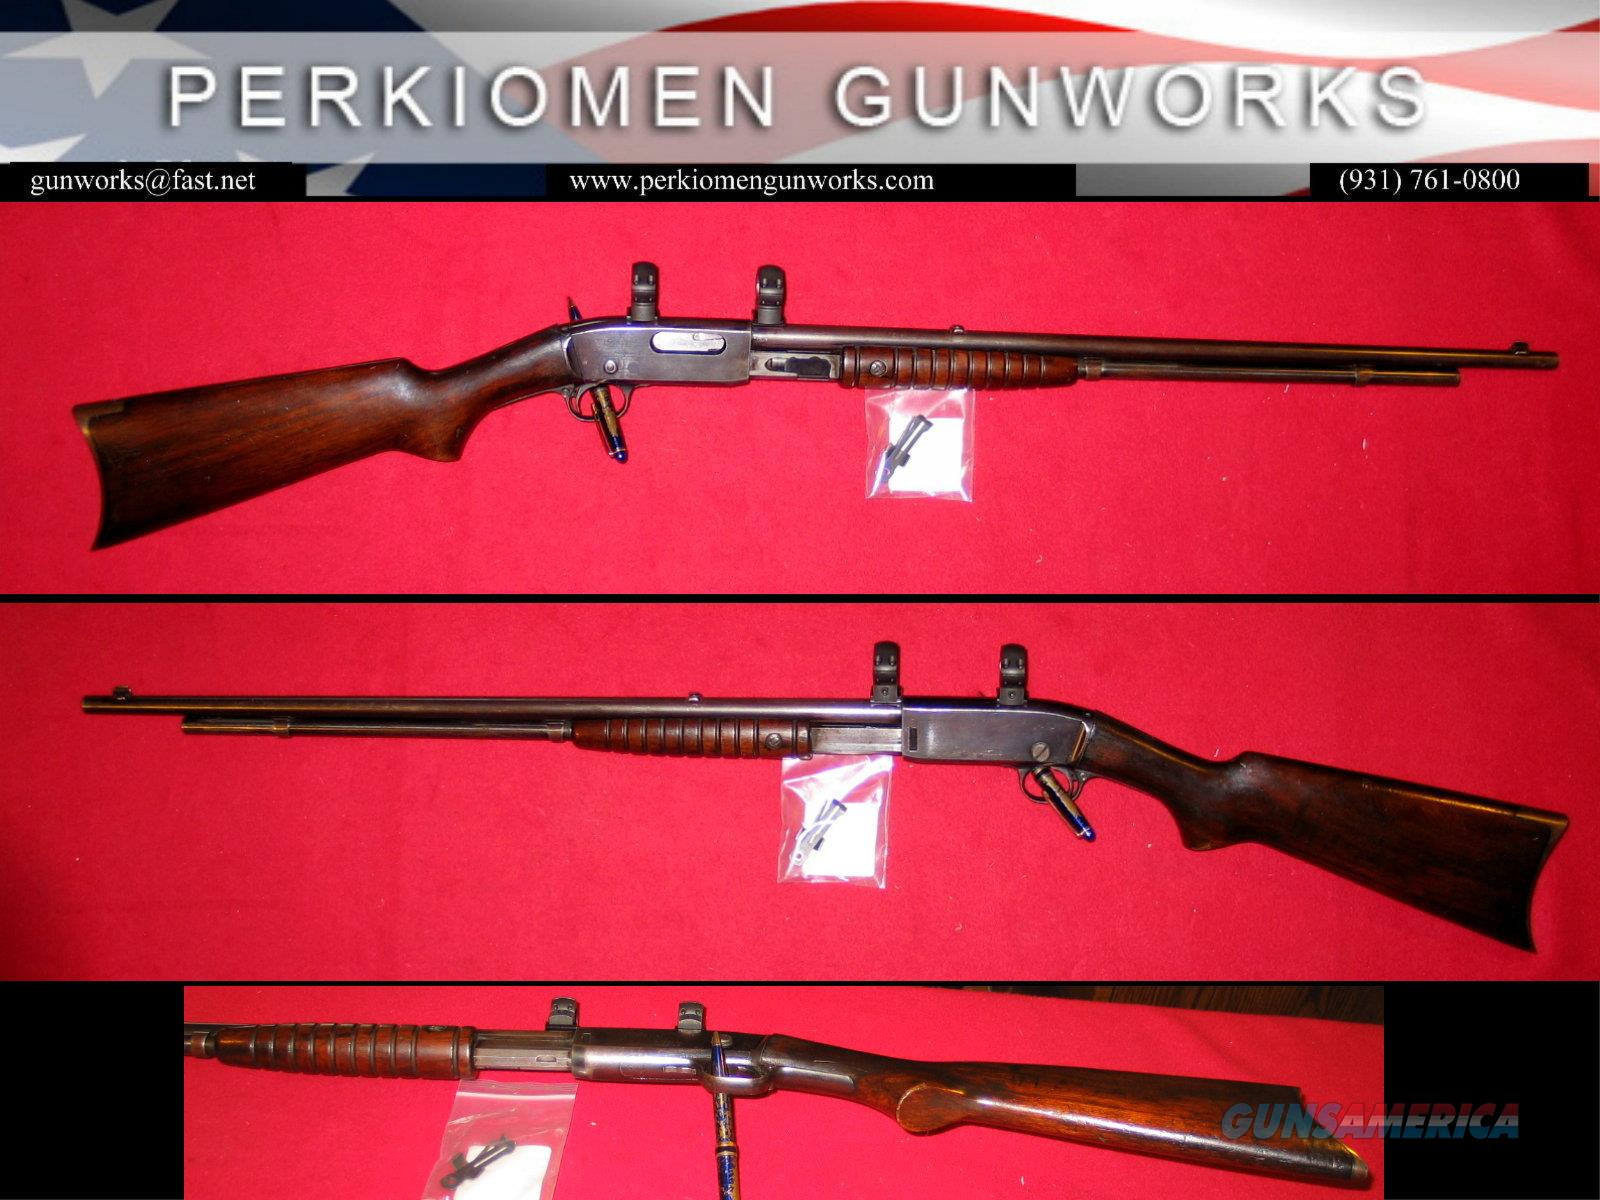 25 Pump Rifle in .25-20, 24 inch - SHOOTER  Guns > Rifles > Remington Rifles - Modern > Other